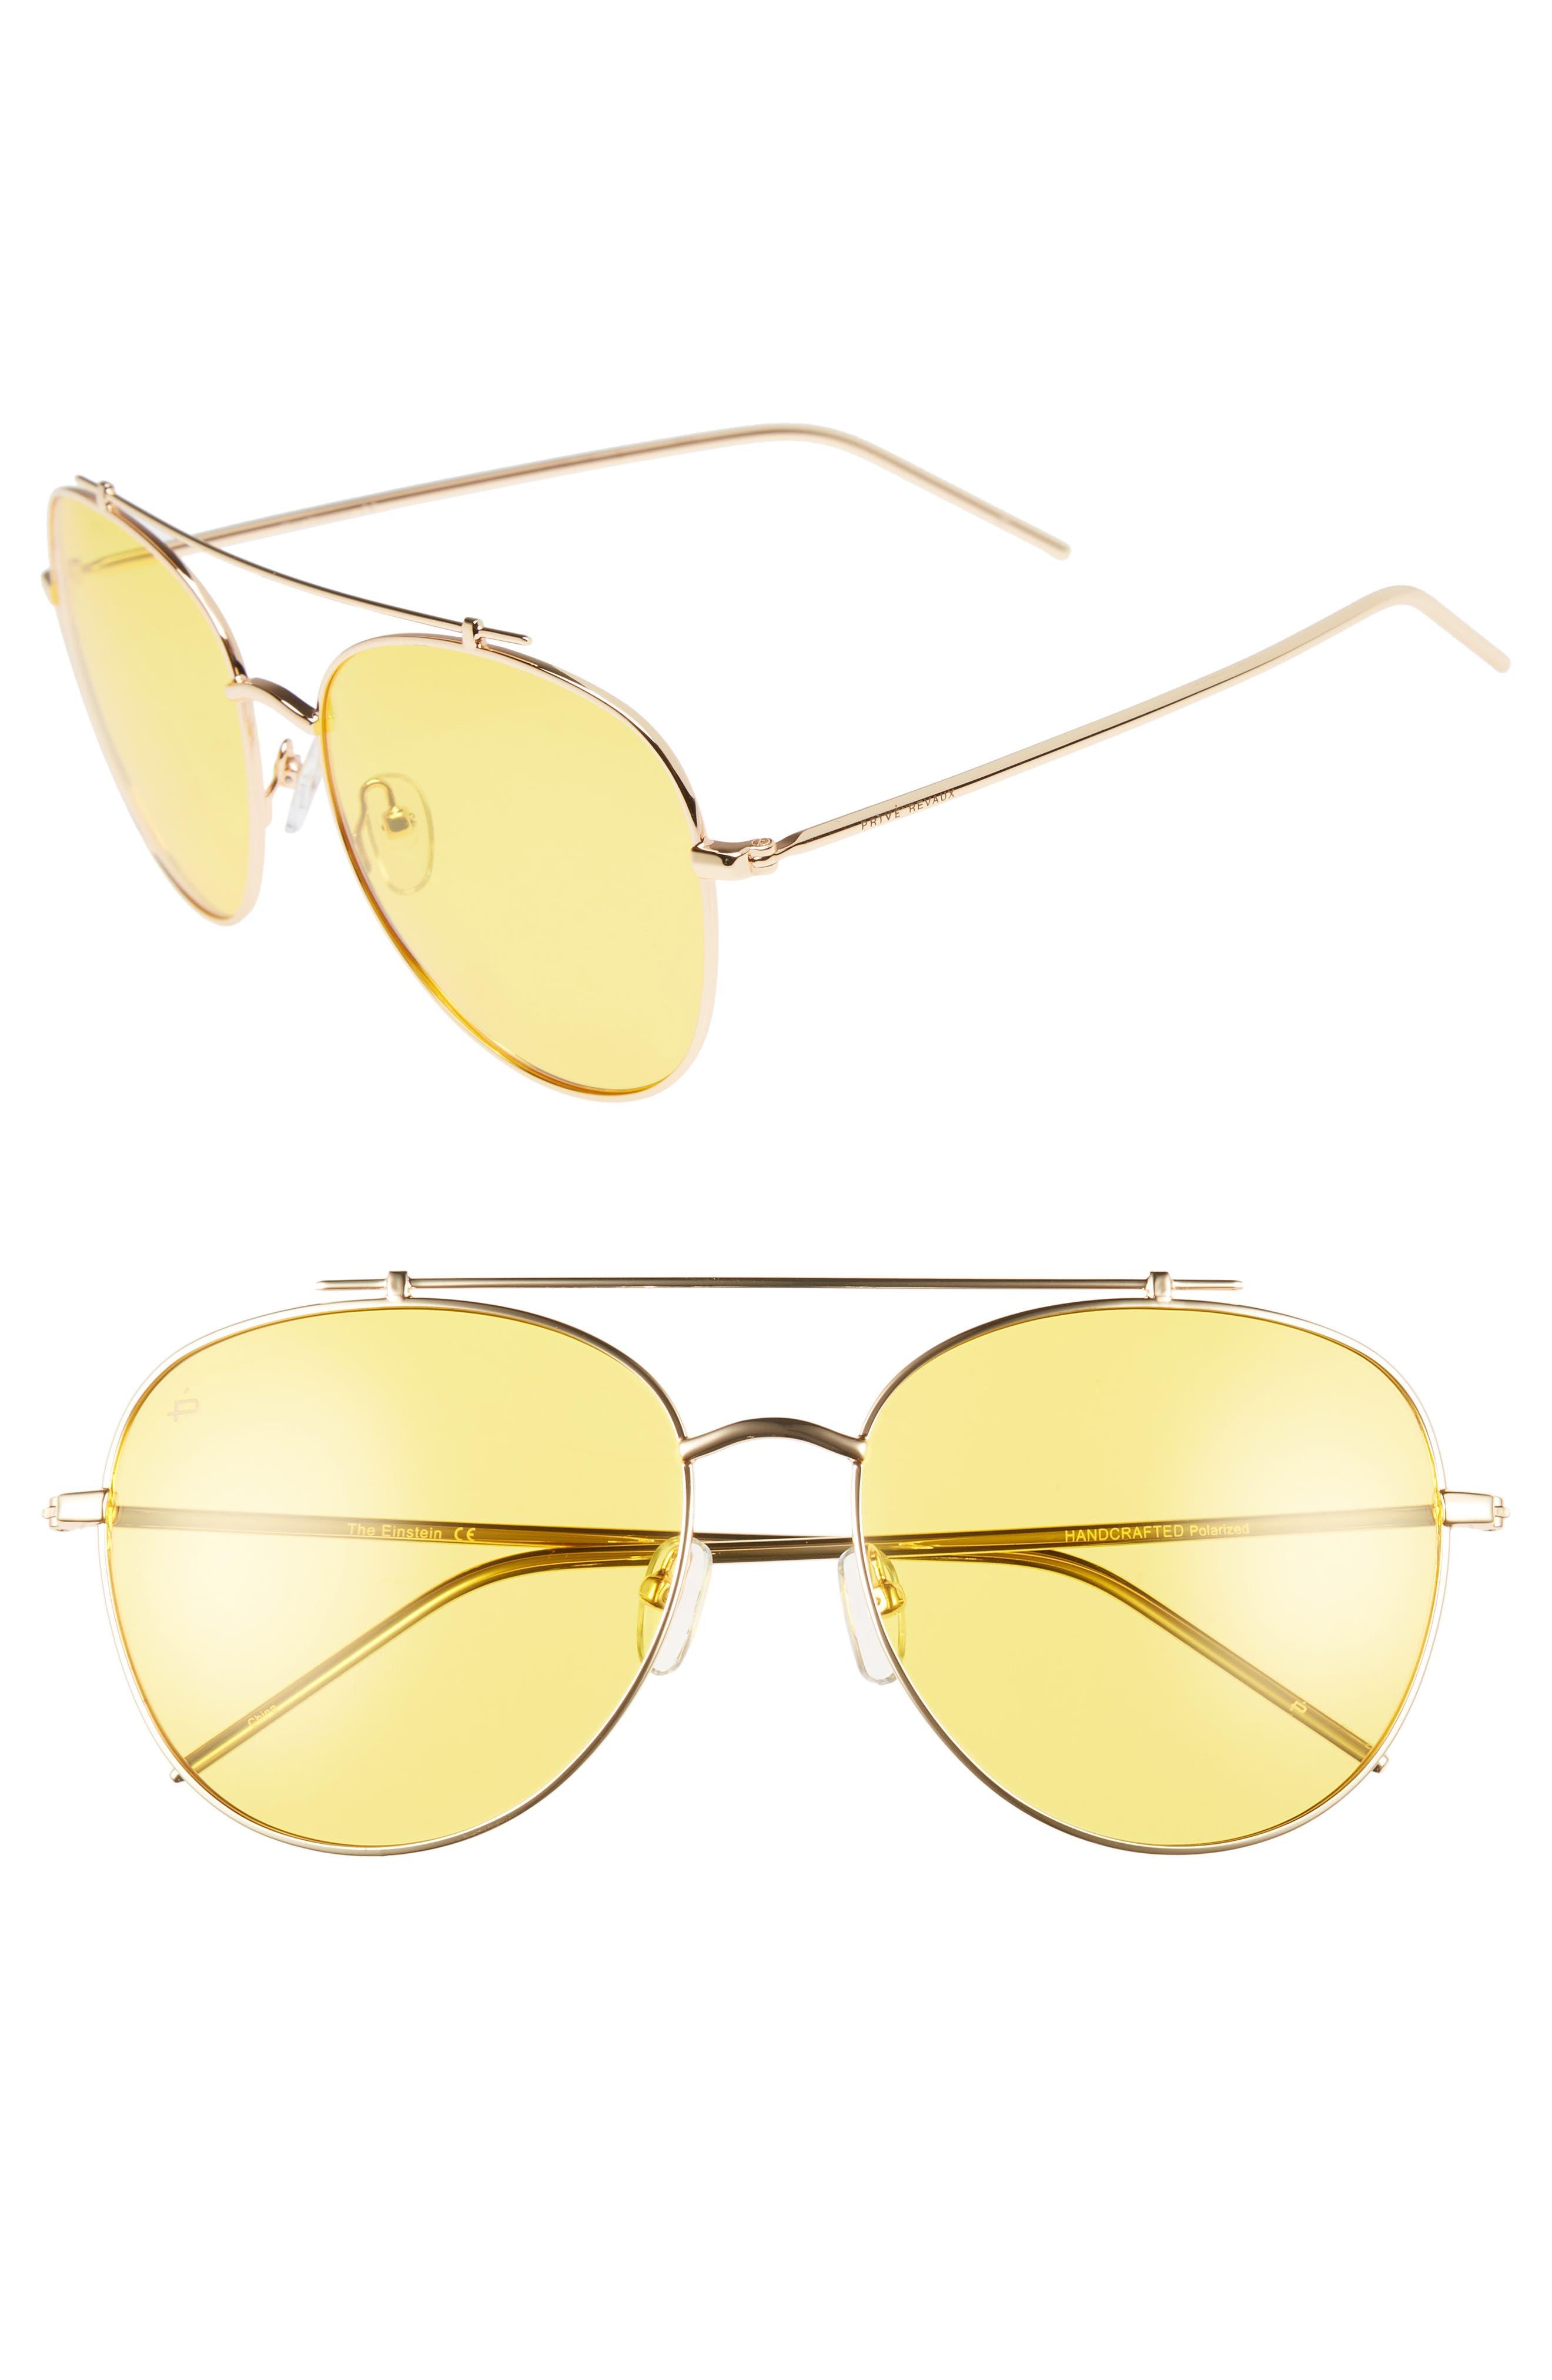 Privé Revaux The Einstein 58mm Polarized Aviator Sunglasses,                         Main,                         color, Yellow